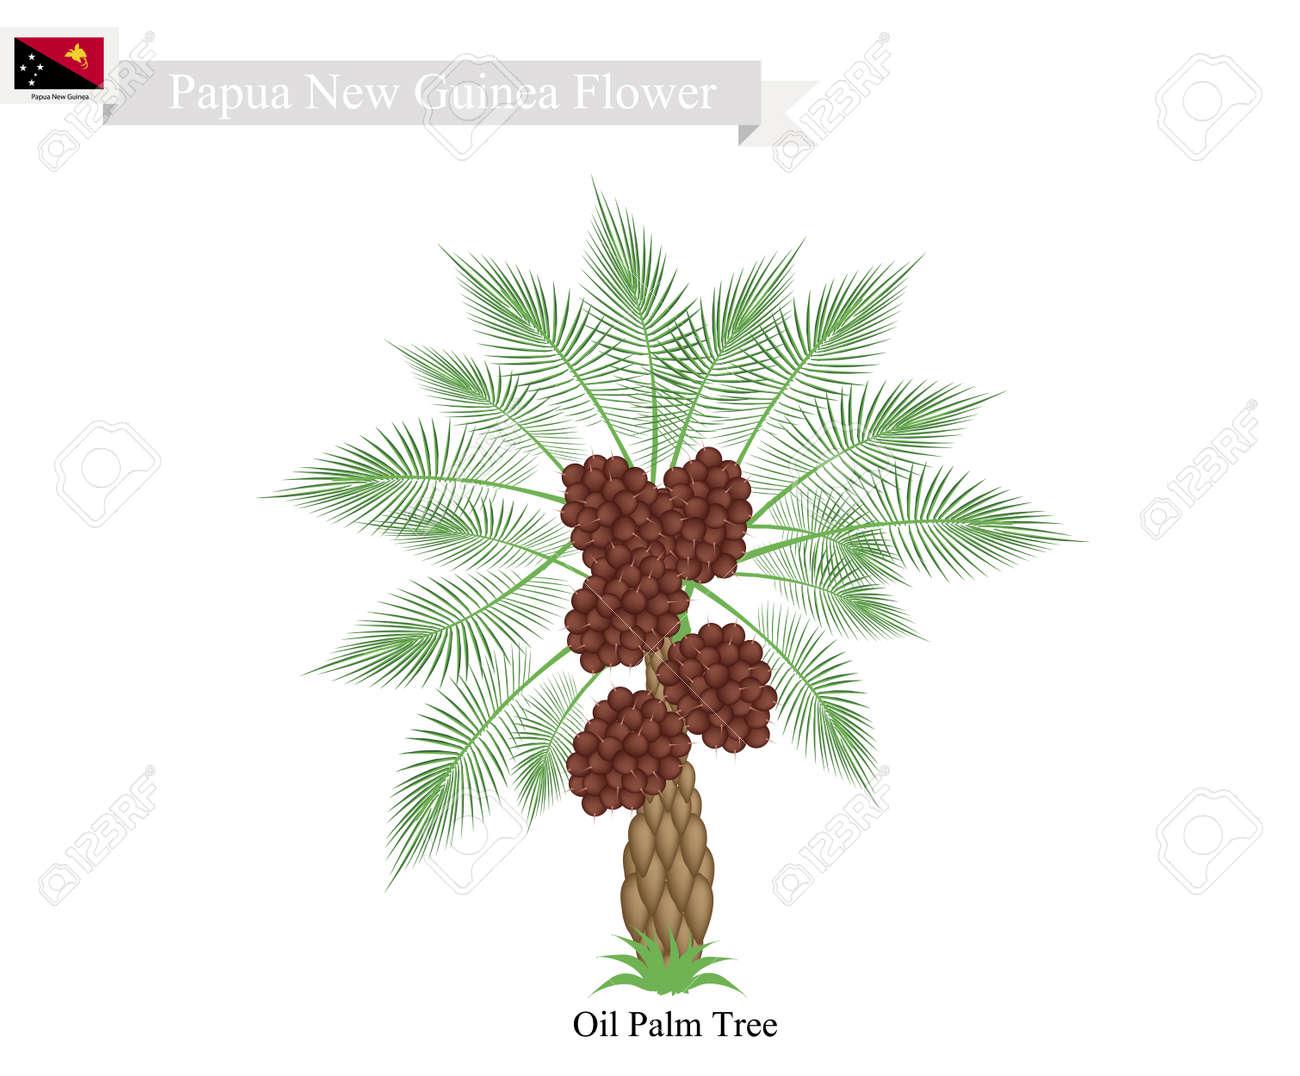 Papua New Guinea Tree, Illustration of Coconut Tree. The Native Tree of Papua New Guinea. - 63151292